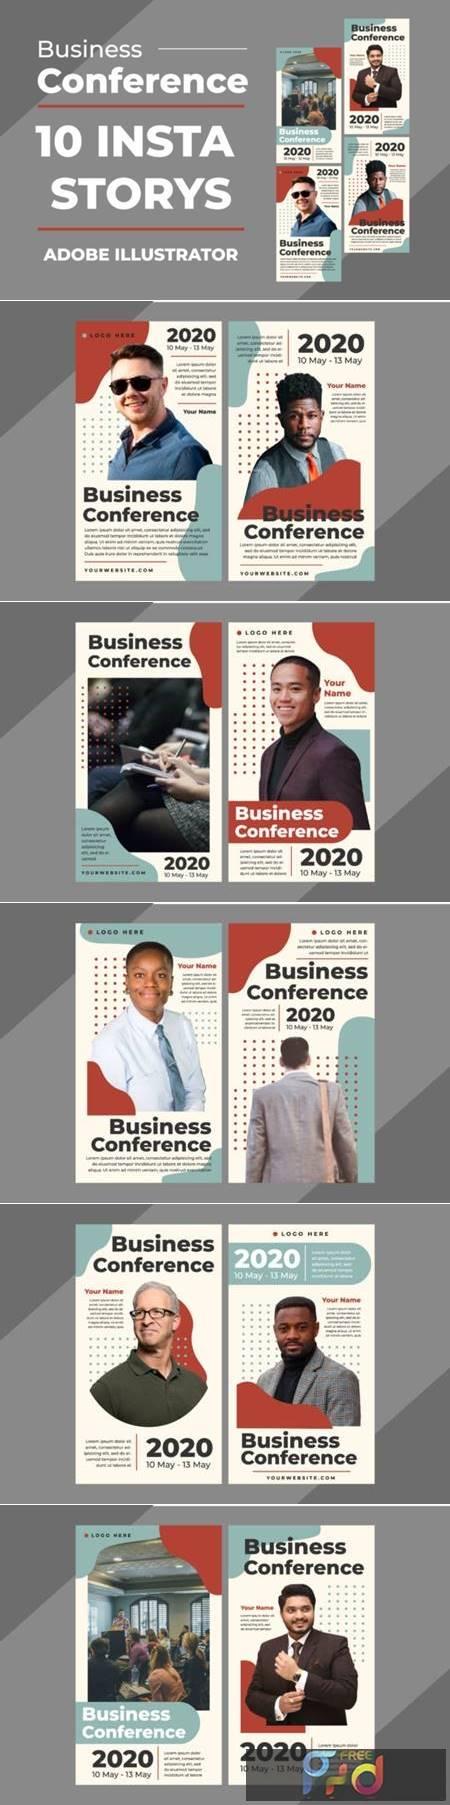 Business Insta Stories Vector Templates 3927682 1